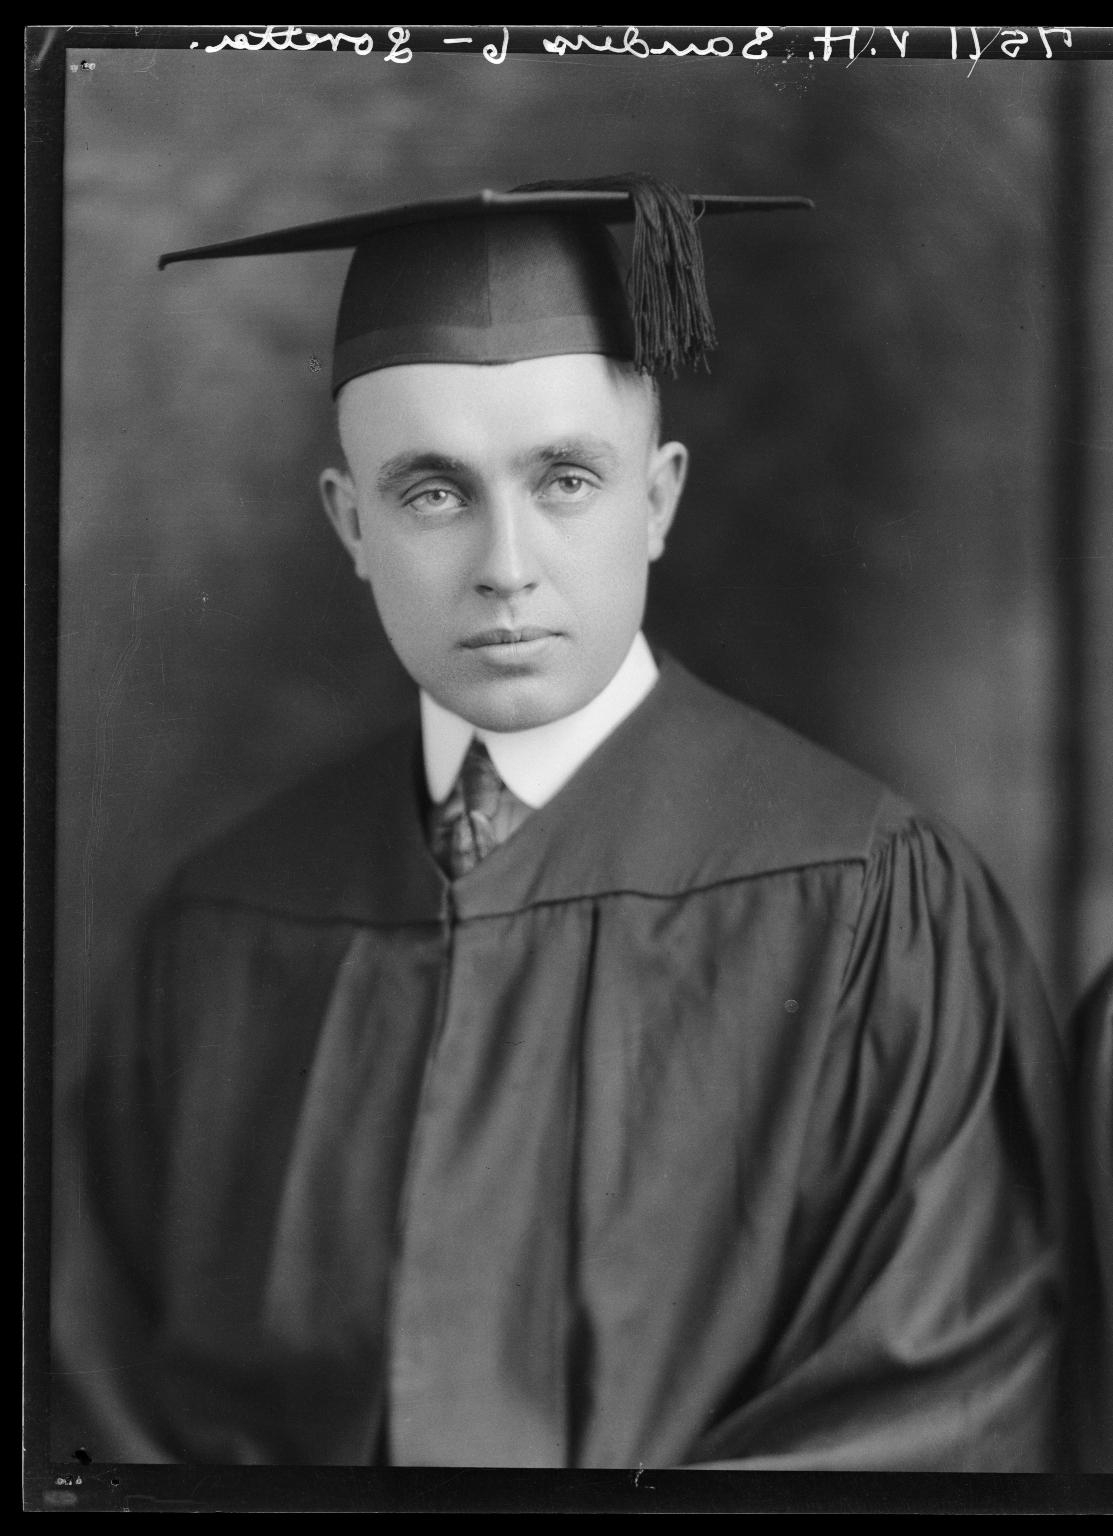 Portraits of V. H. Sanders